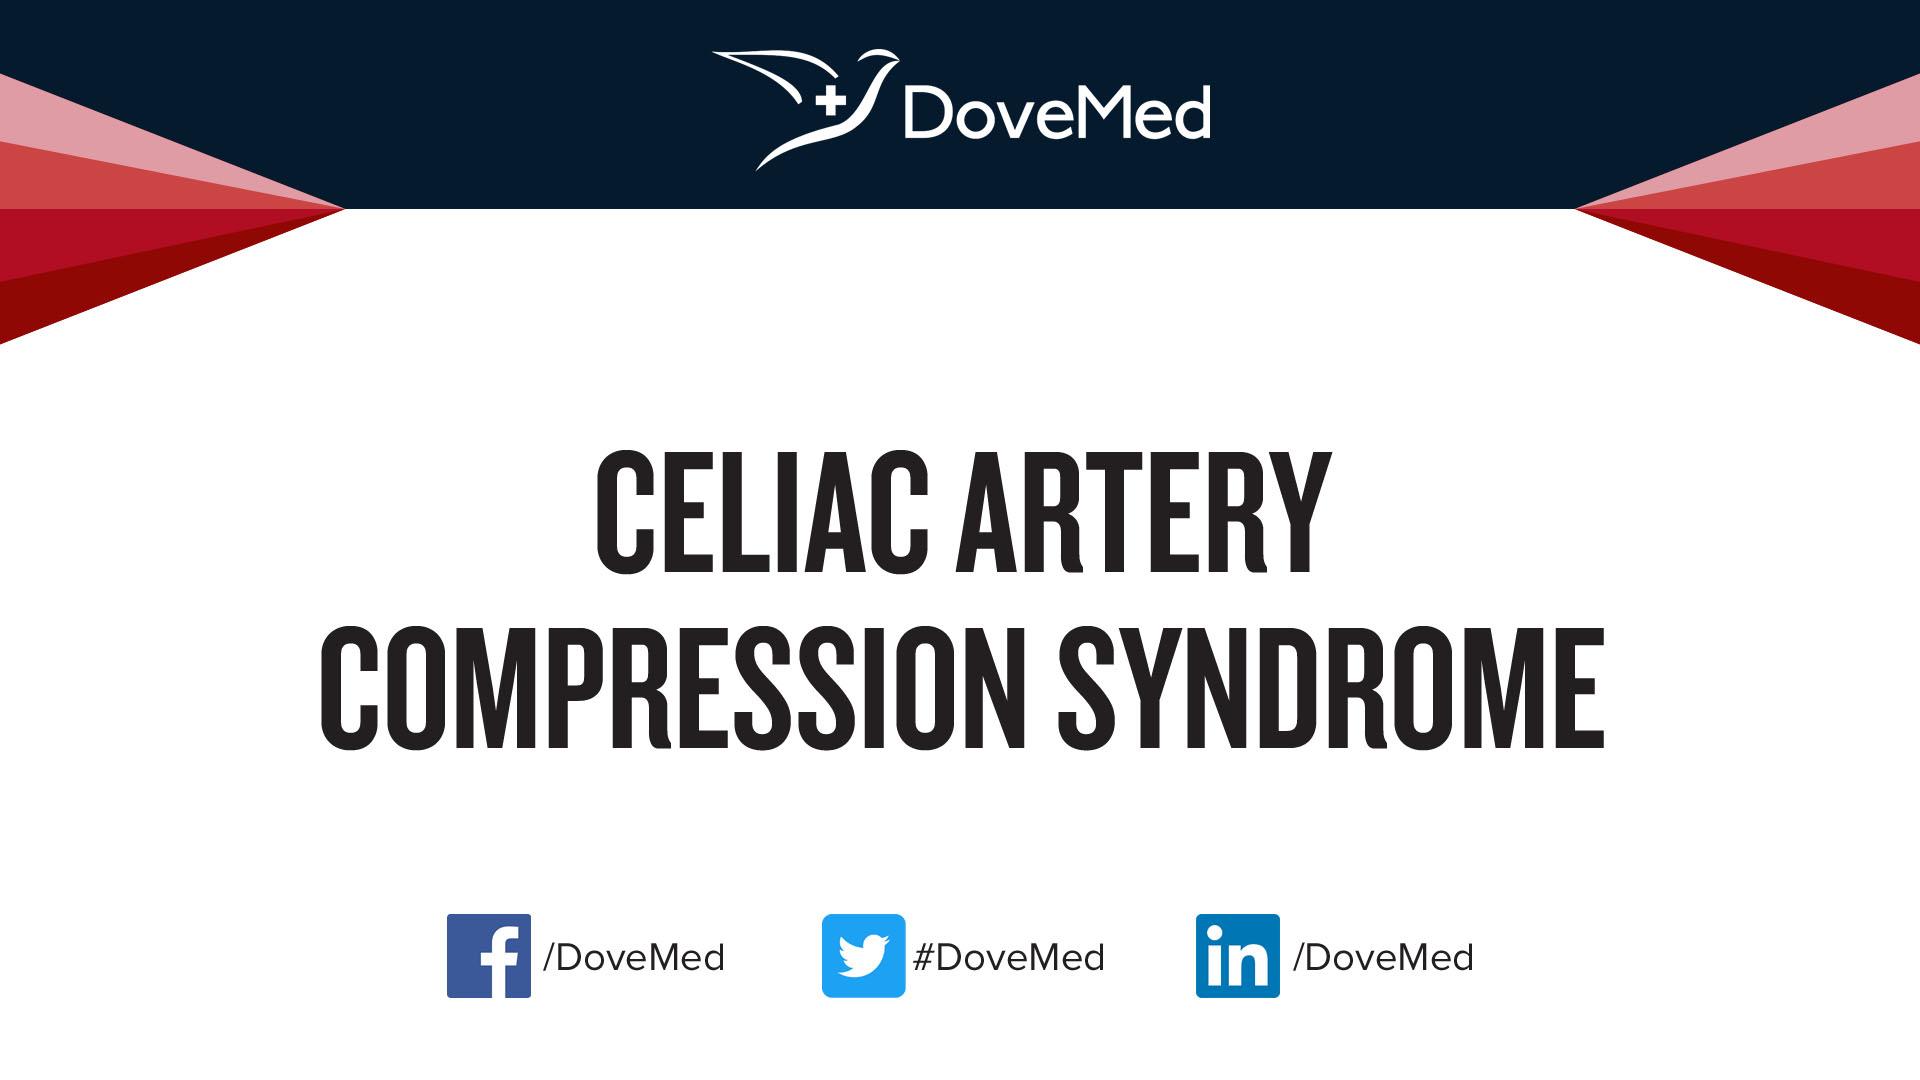 Celiac Artery Compression Syndrome